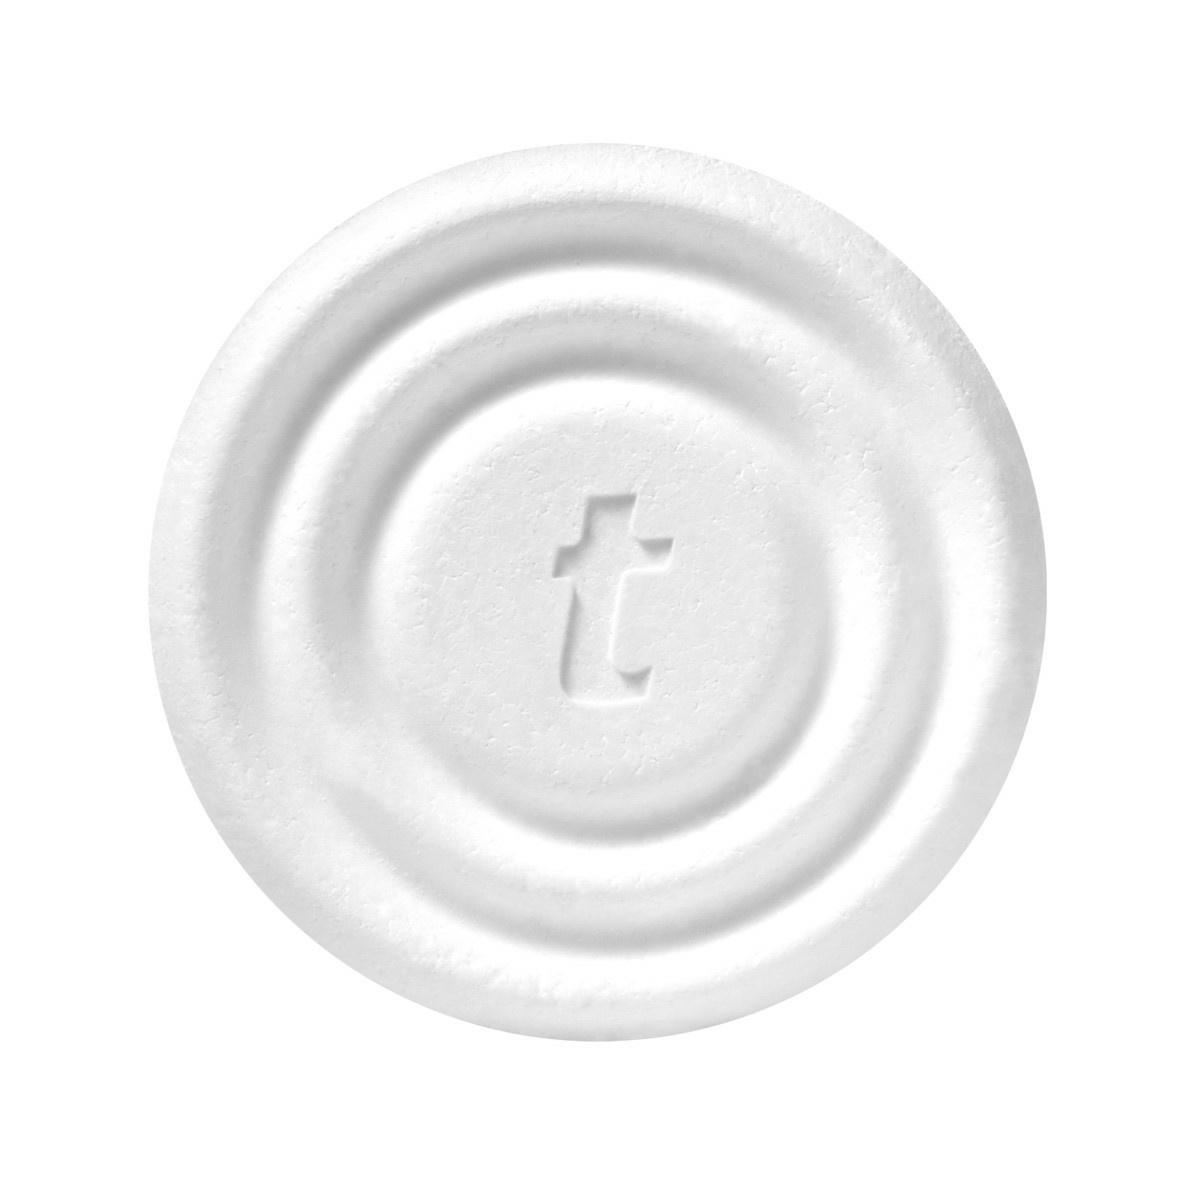 Tabletă de captator umiditate Tescoma CLEANKIT, 2 buc. imagine 2021 e4home.ro